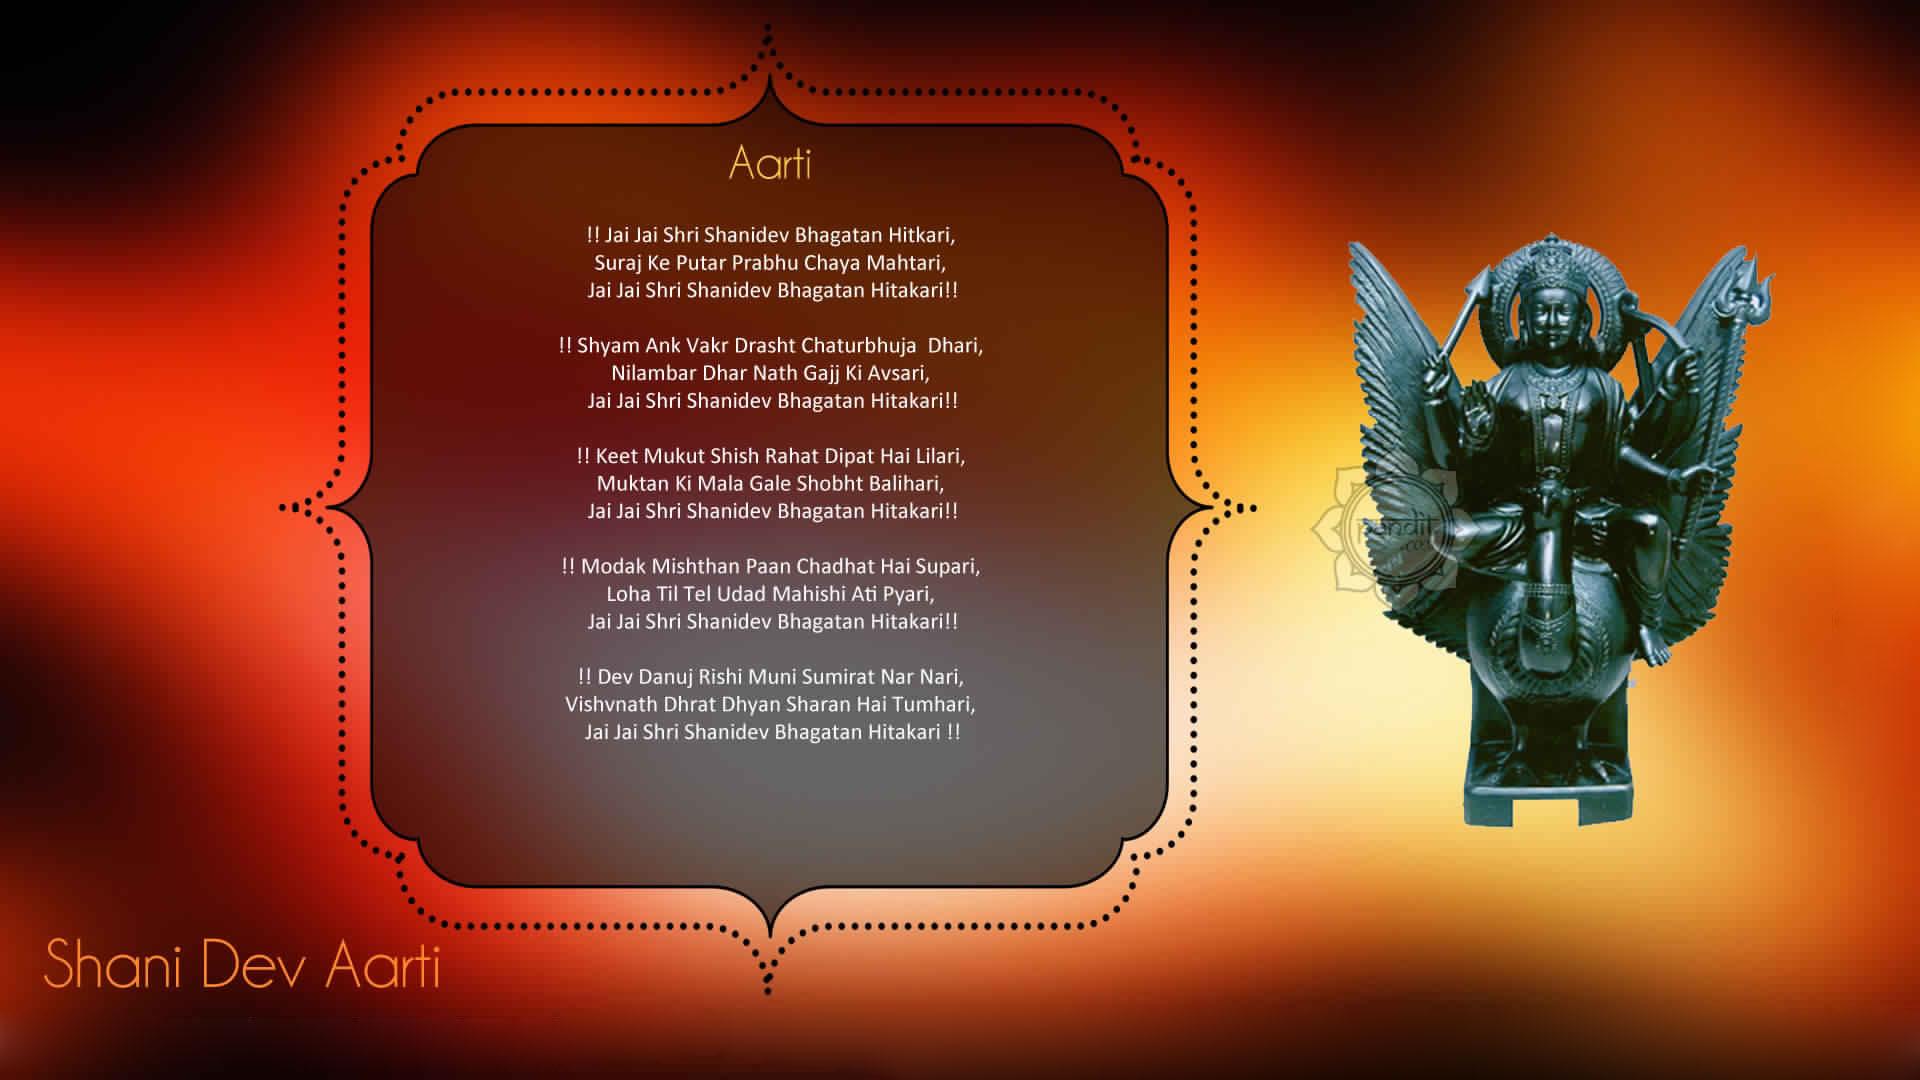 Shani Dev Aarti Hd Wallpapers Aarti